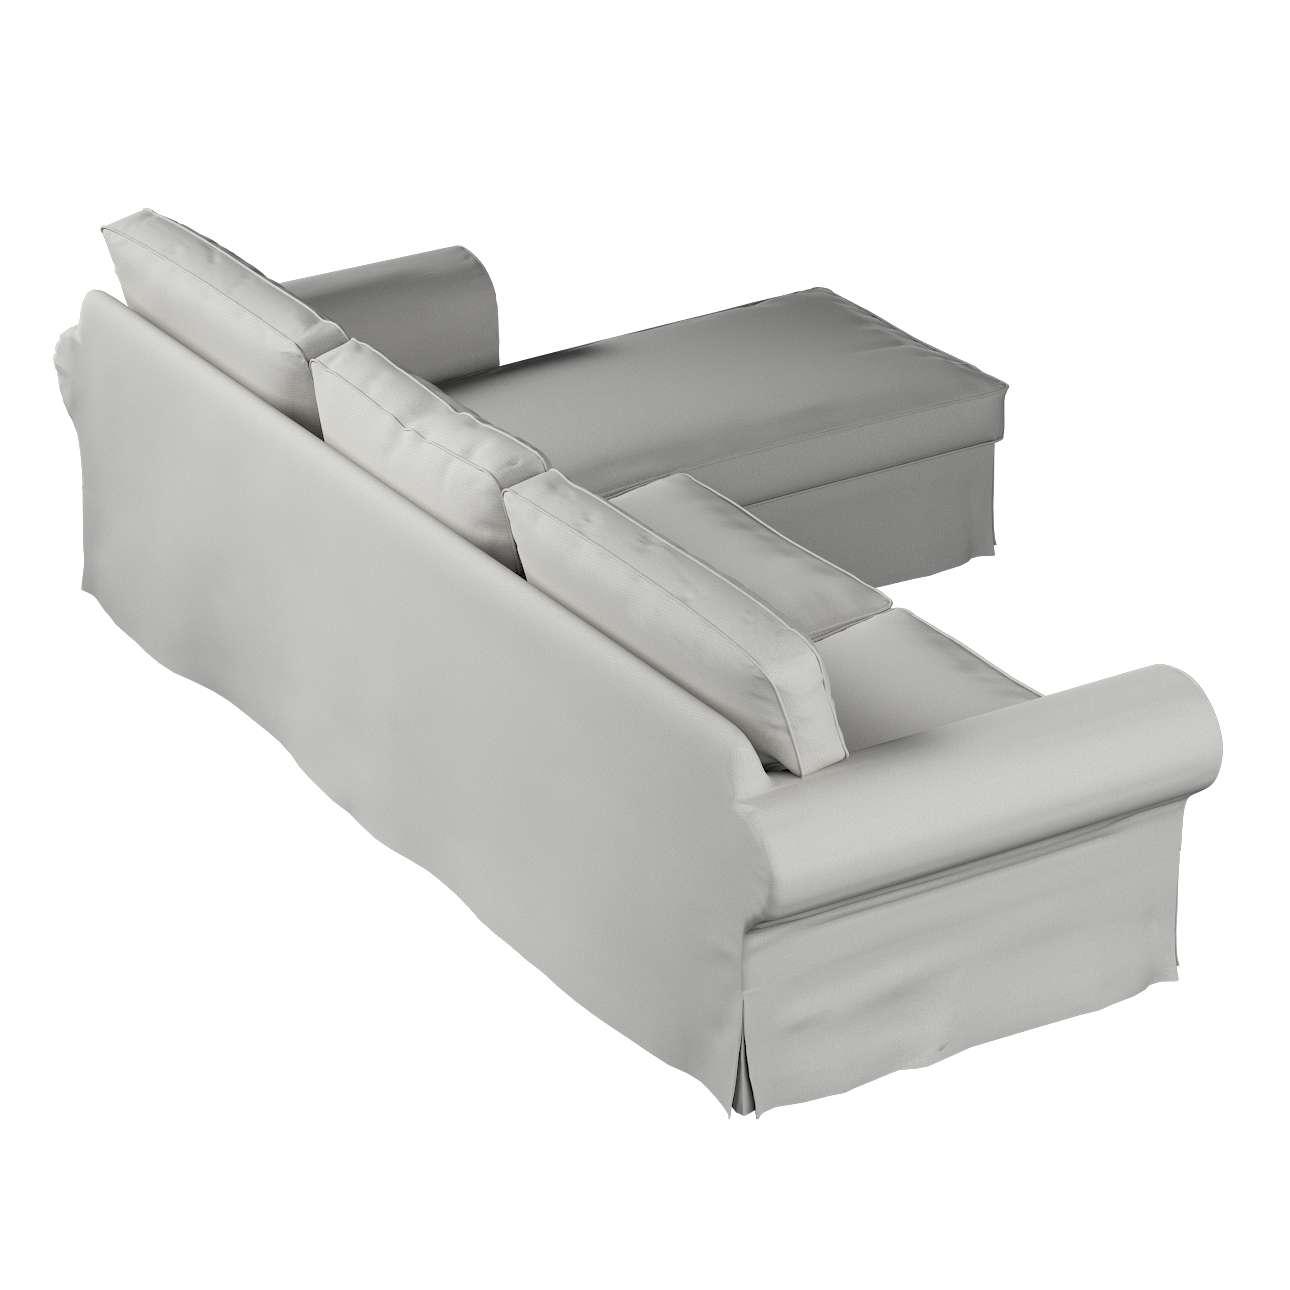 Ektorp 2-Sitzer Sofabezug mit Recamiere Ektorp 2-Sitzer Sofabezug mit Recamiere von der Kollektion Etna, Stoff: 705-90